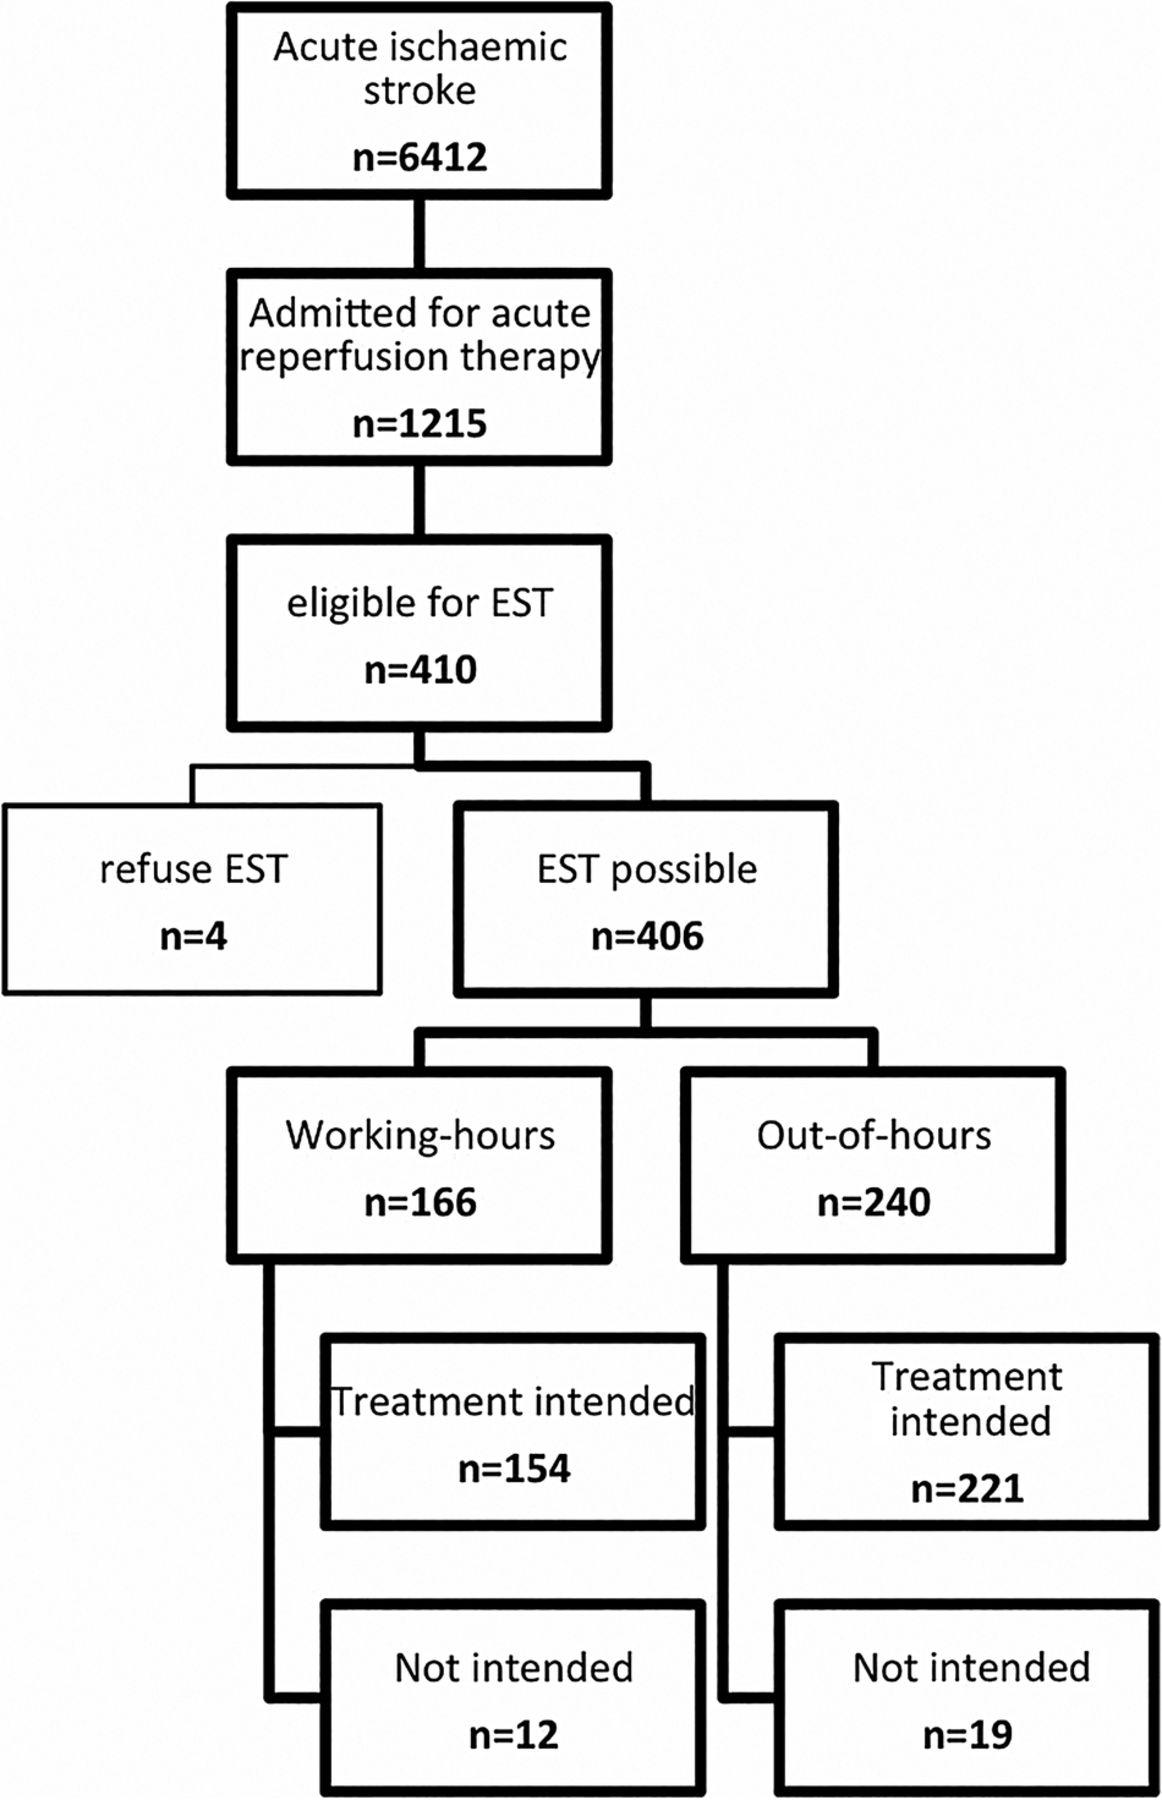 Weekend Effect In Endovascular Stroke Treatment  Do